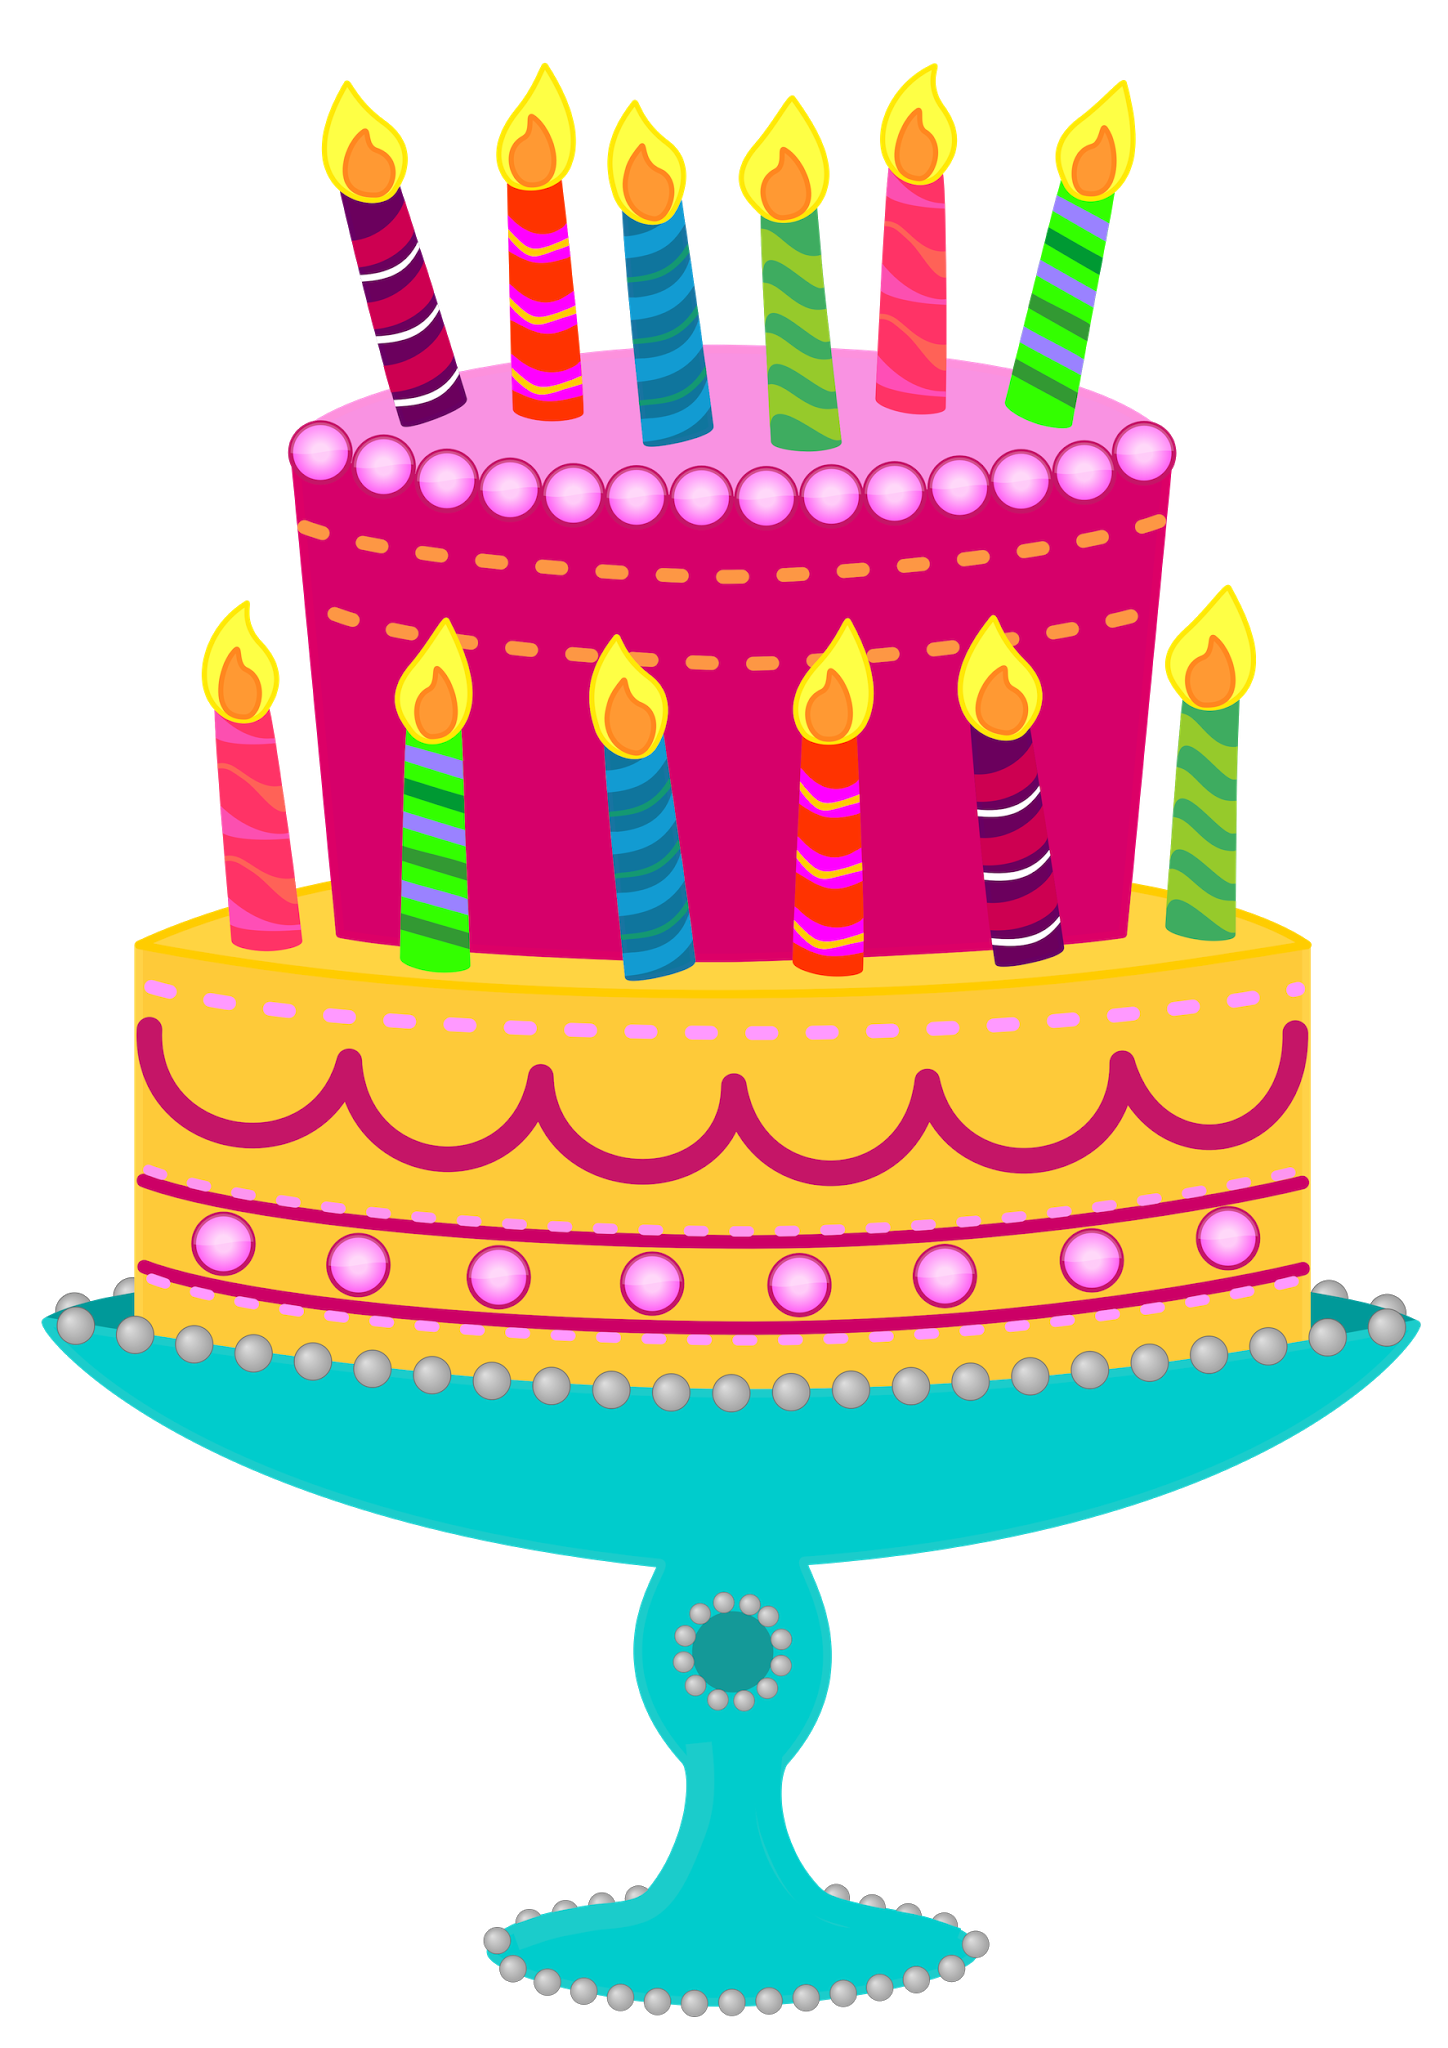 birthday cake clipart-birthday cake clipart-5